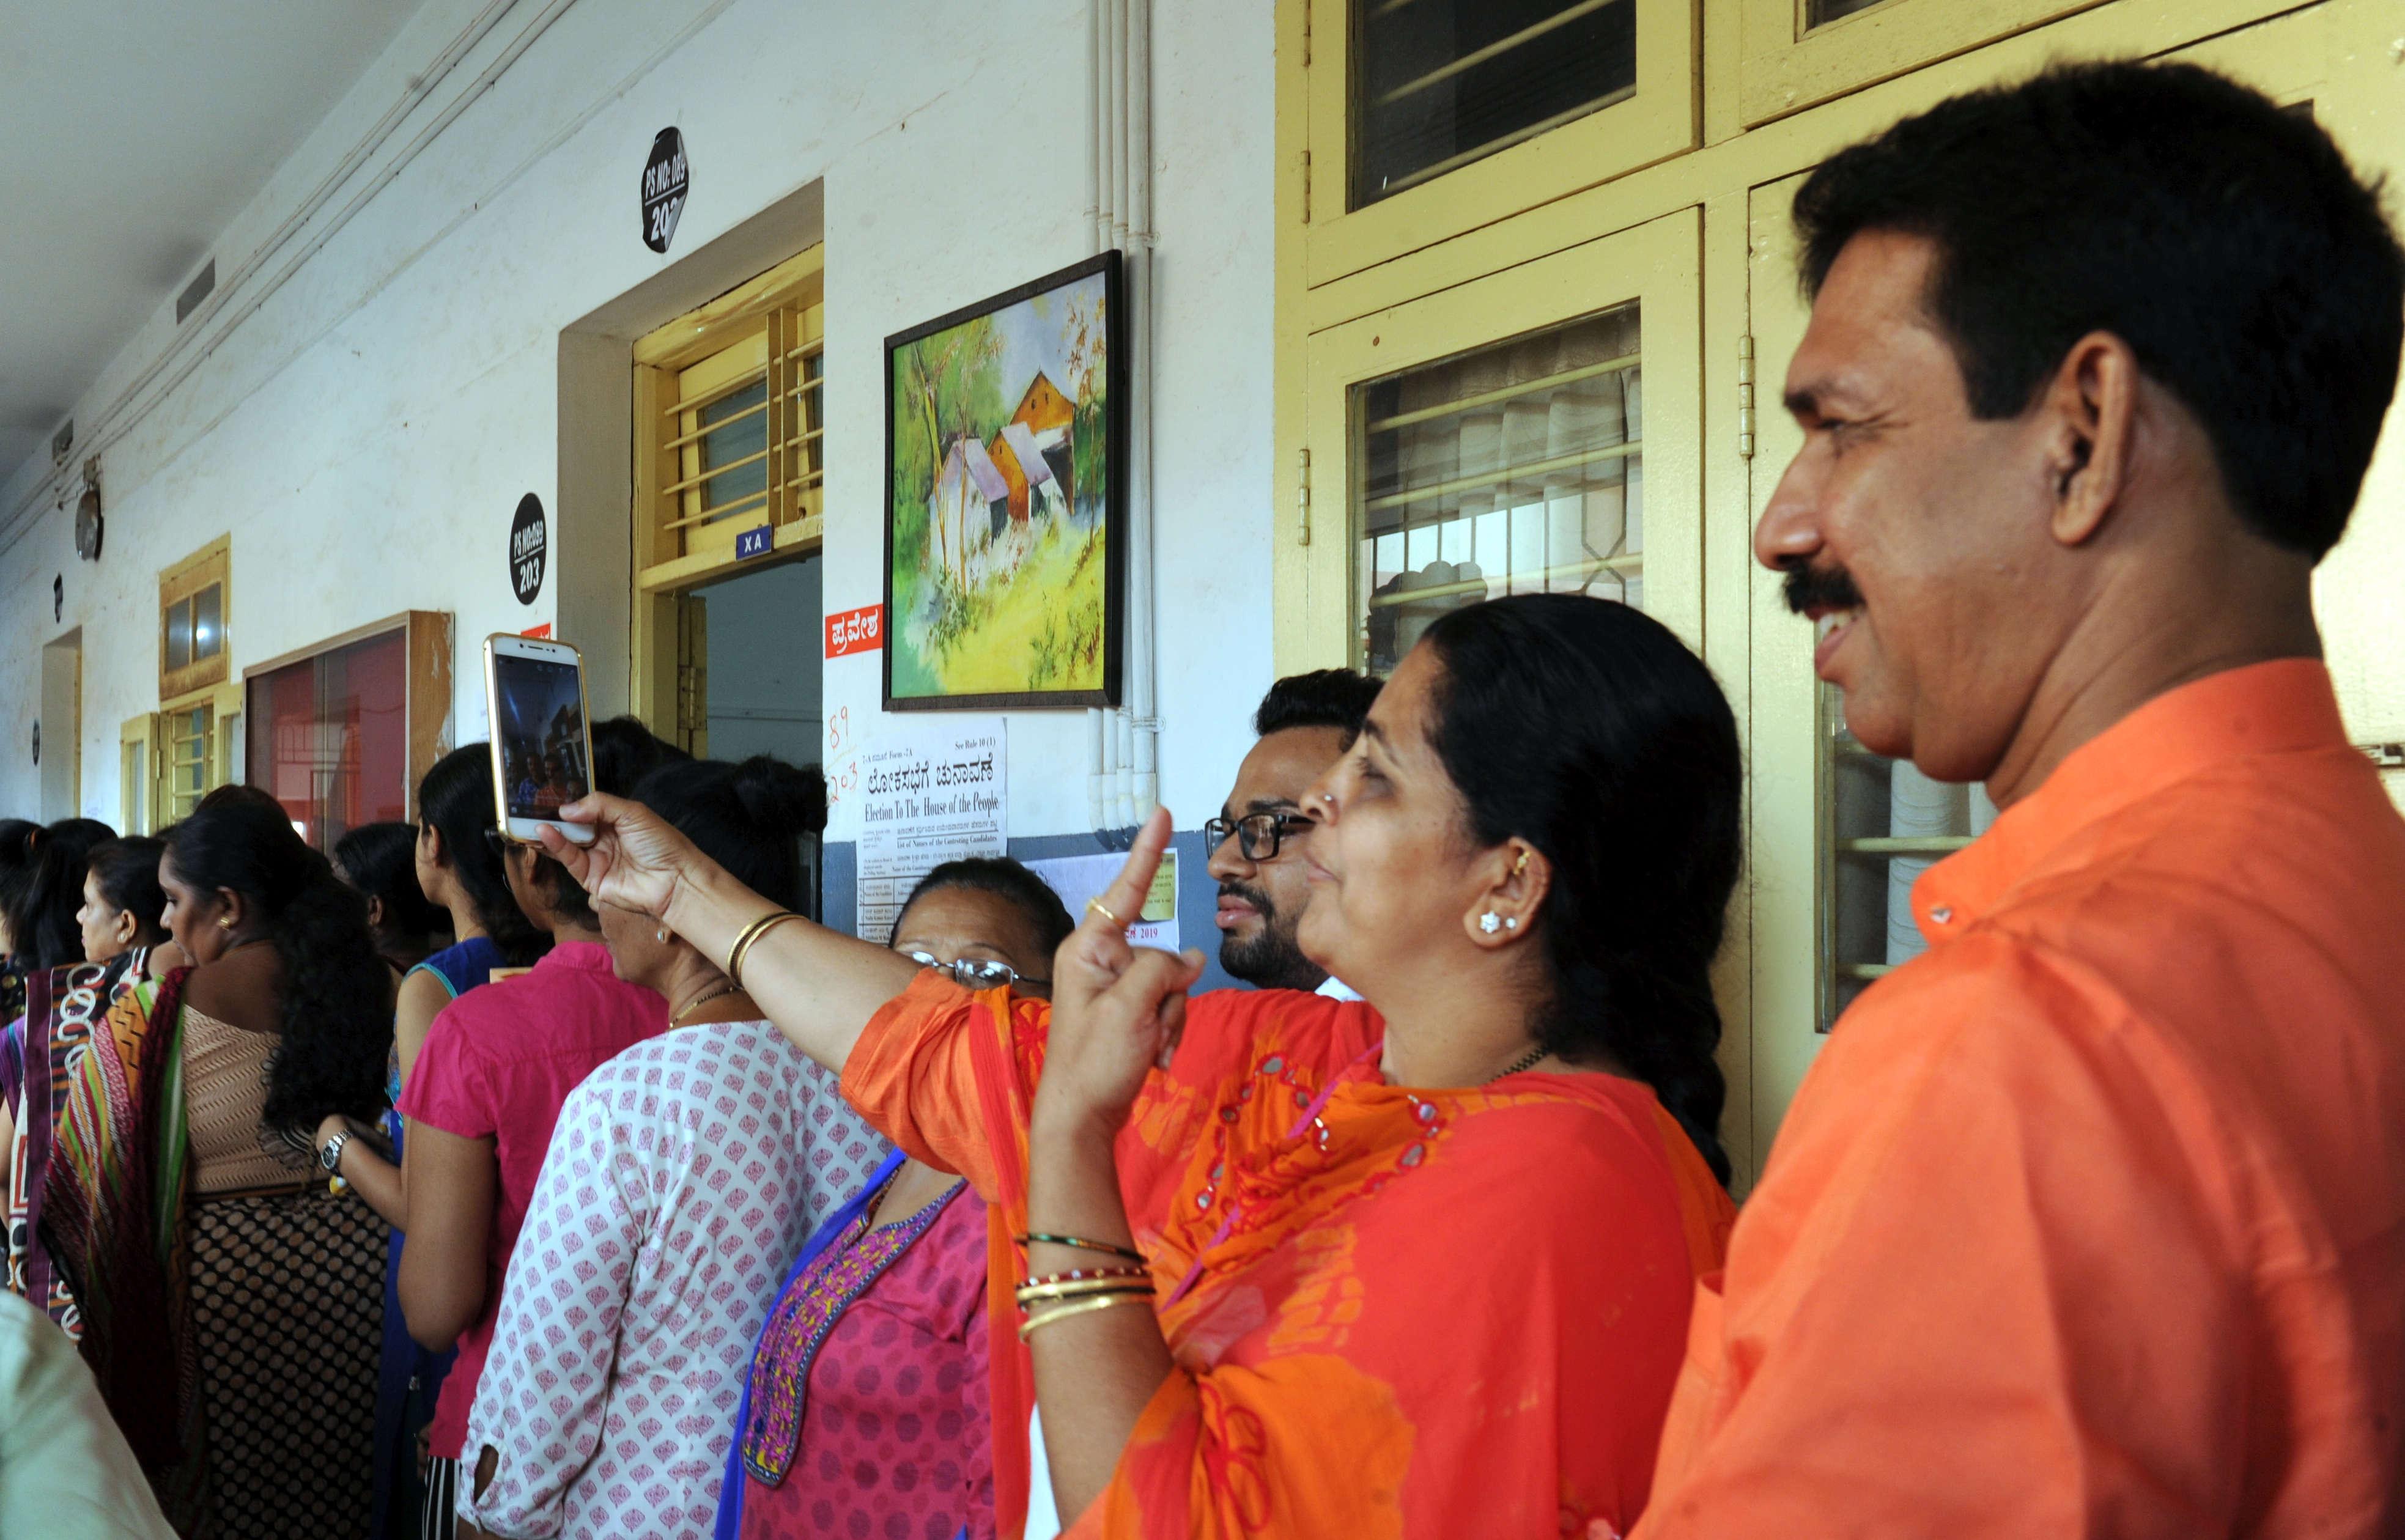 UP schools make selfie a must to mark attendance